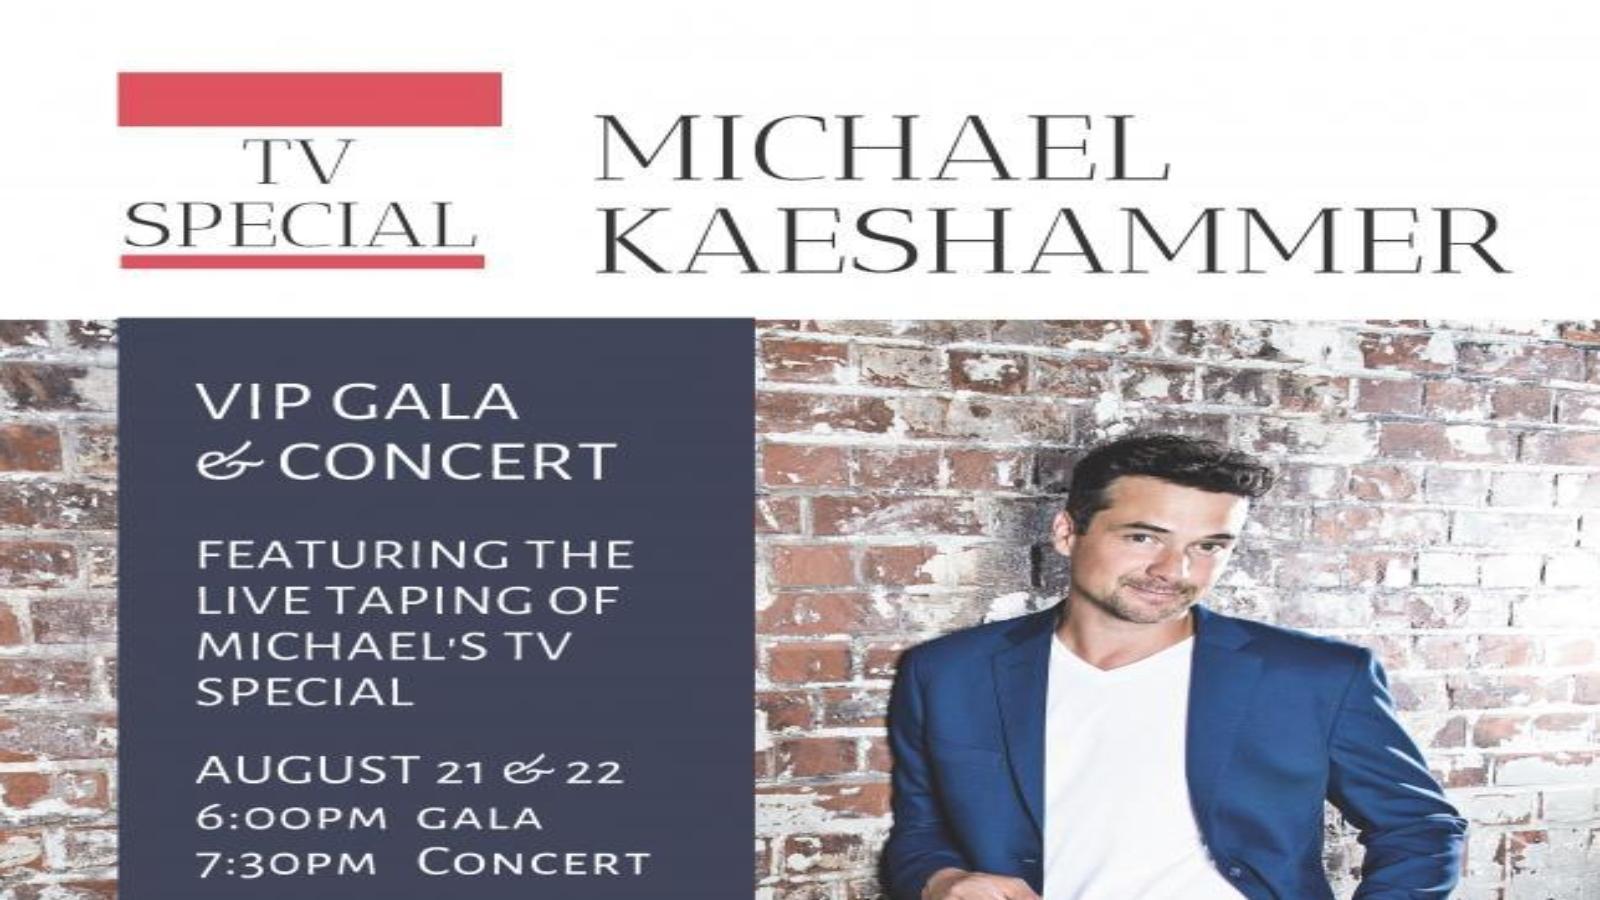 Win Tickets to Micheal Kaeshammer